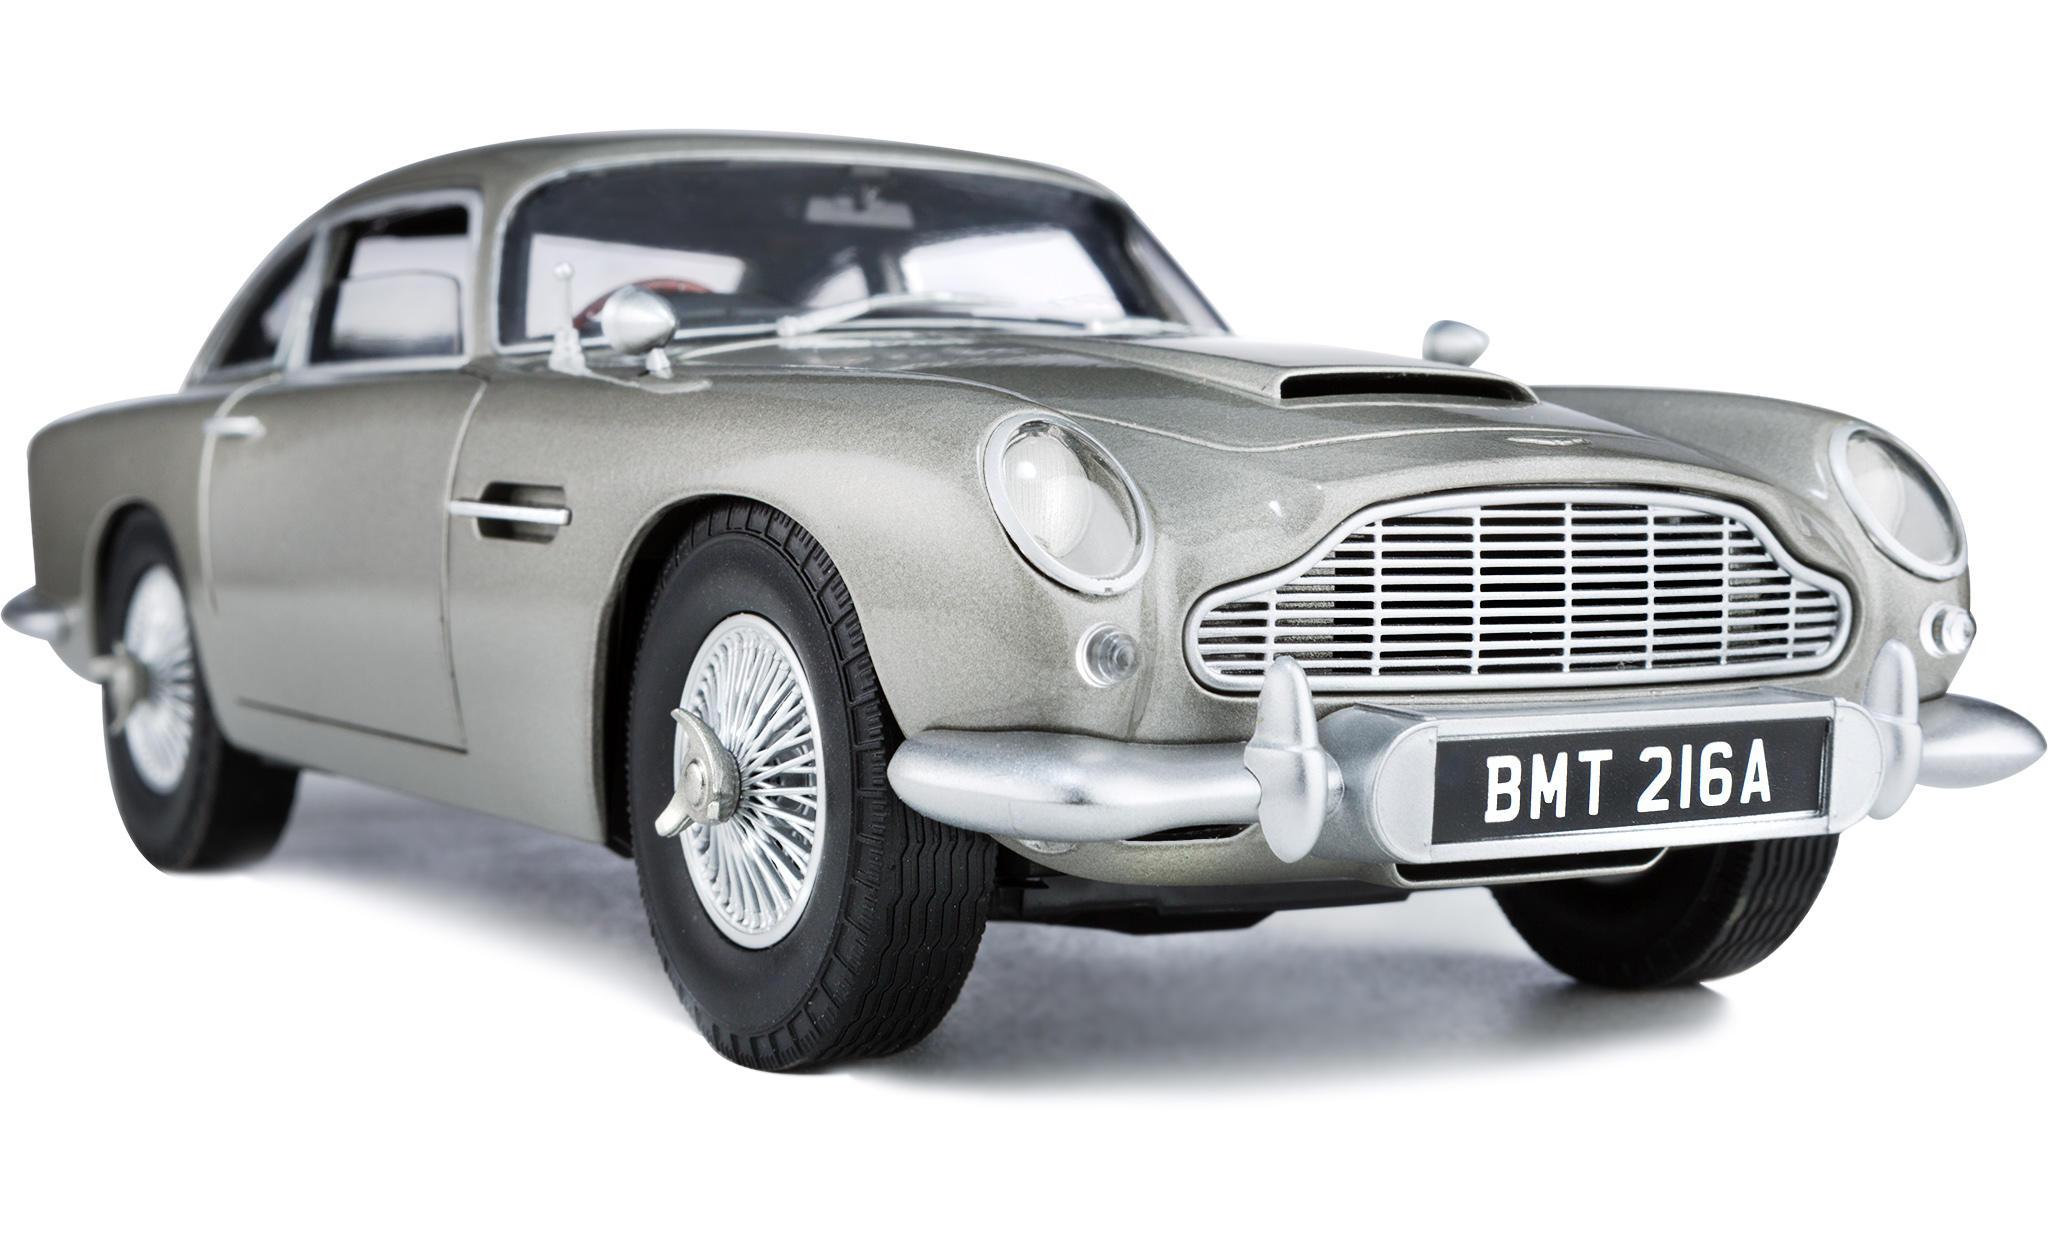 James Bond Goldfinger Aston Martin DB - Aston martin models